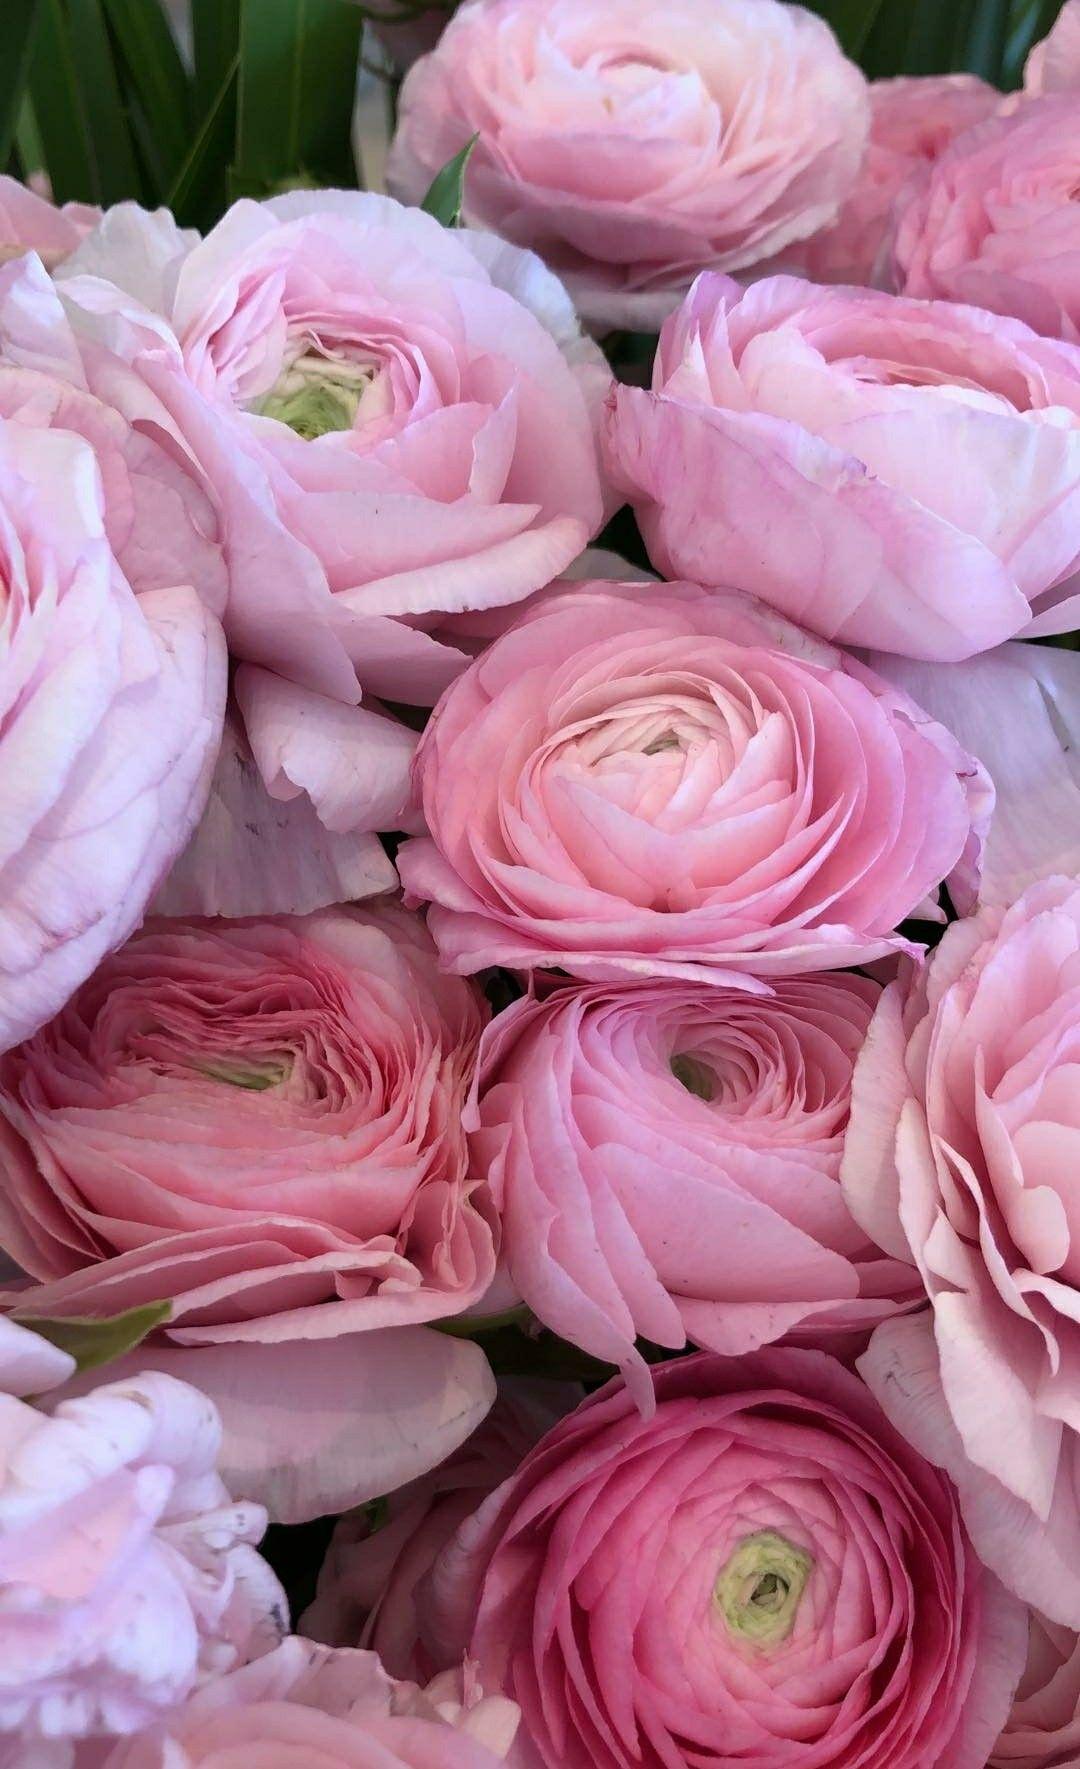 Bialy Krokus Tapeta Na Telefon Beautiful Flowers Flowers Dandelion